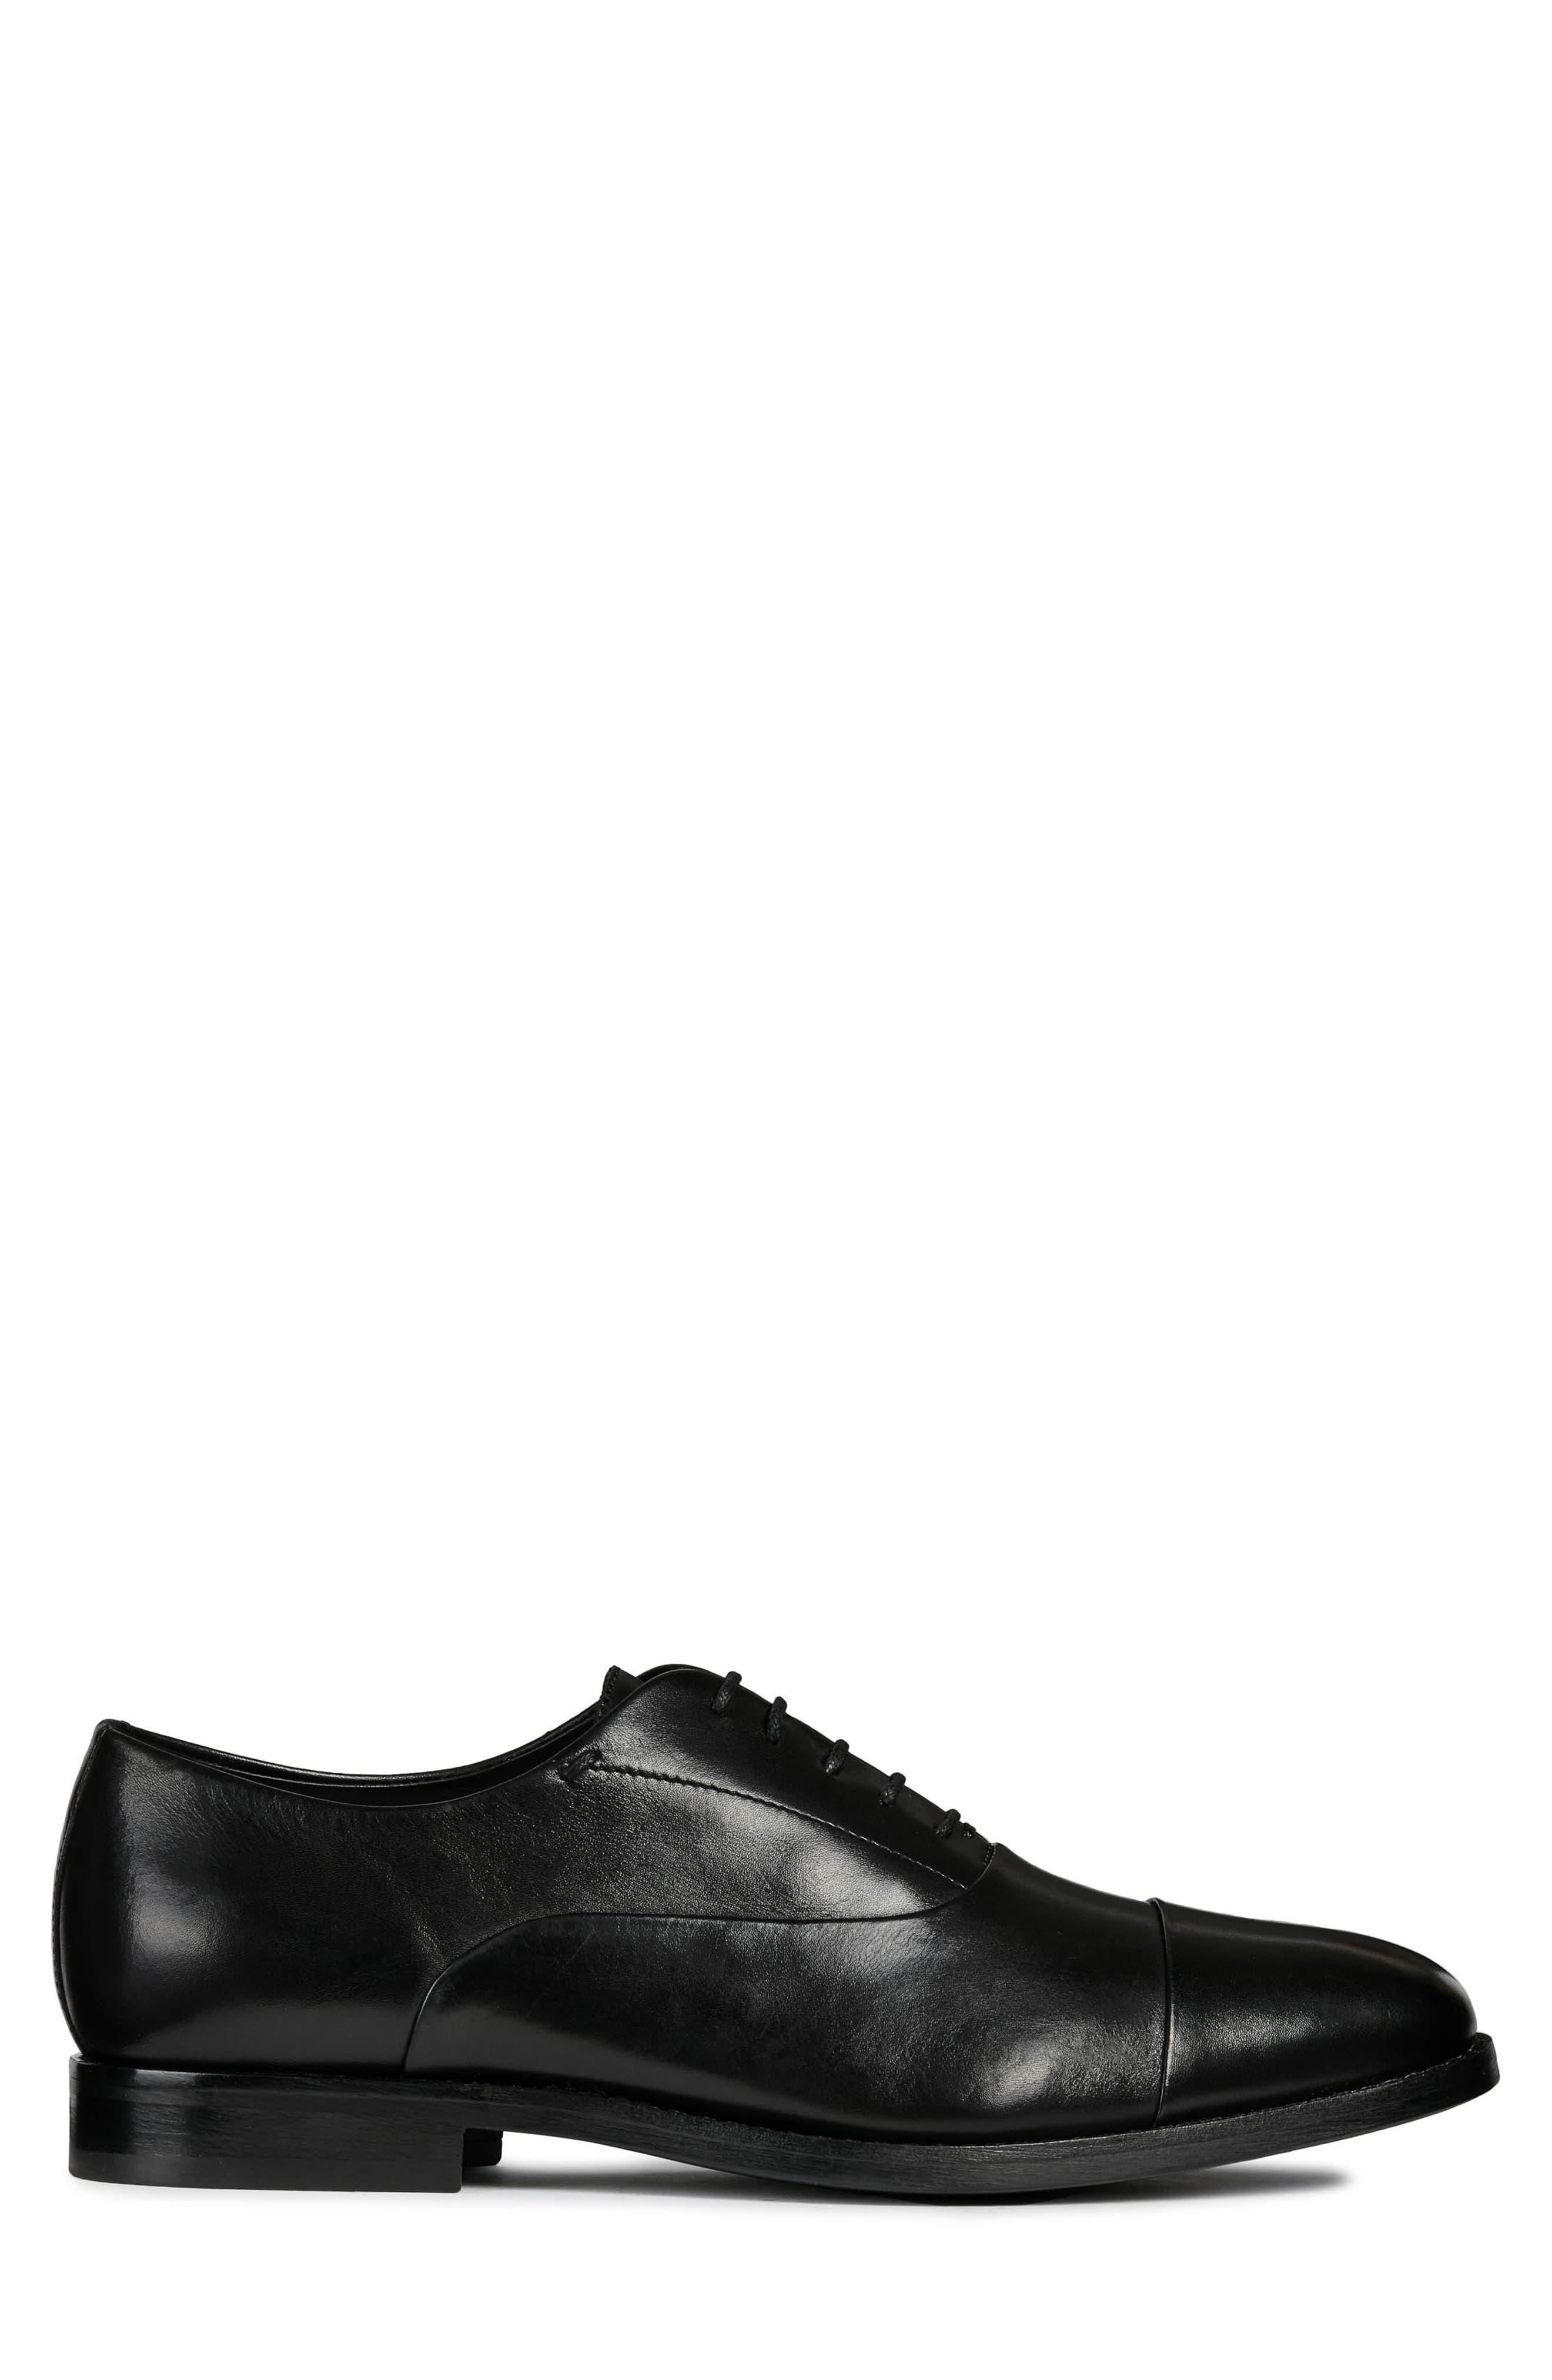 GEOX, Hampstead Cap Toe Oxford, Alternate thumbnail 3, color, BLACK